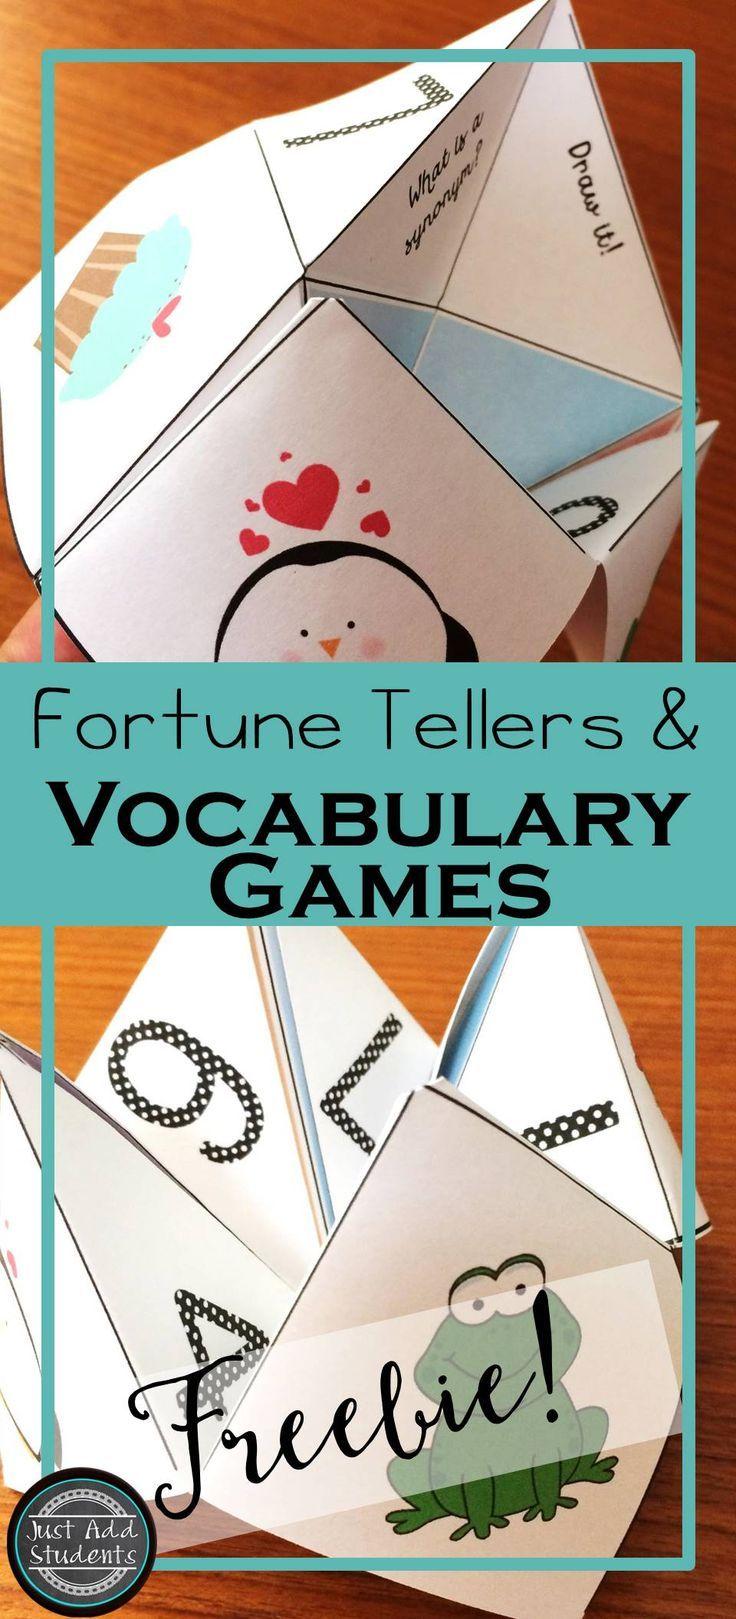 Vocabulary Activities for Kids | Education.com